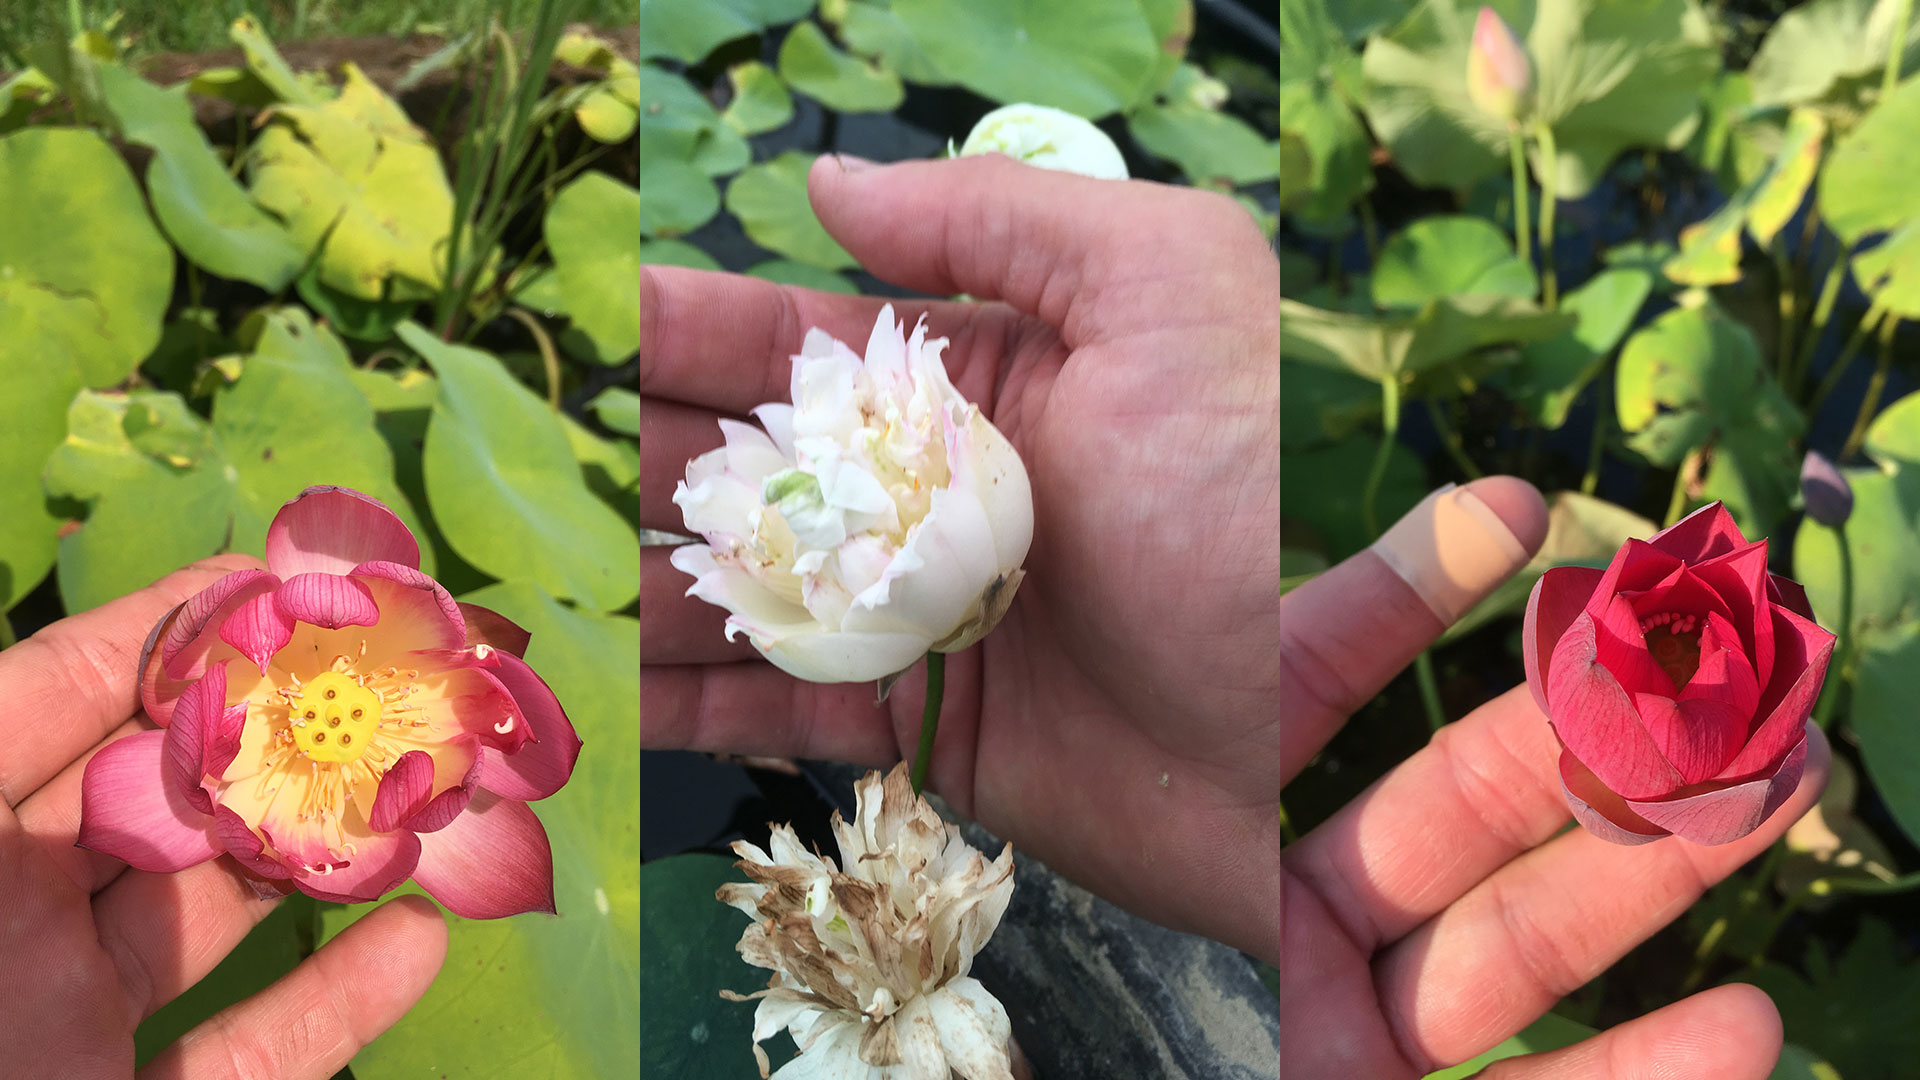 harvest and divide lotus rhizome